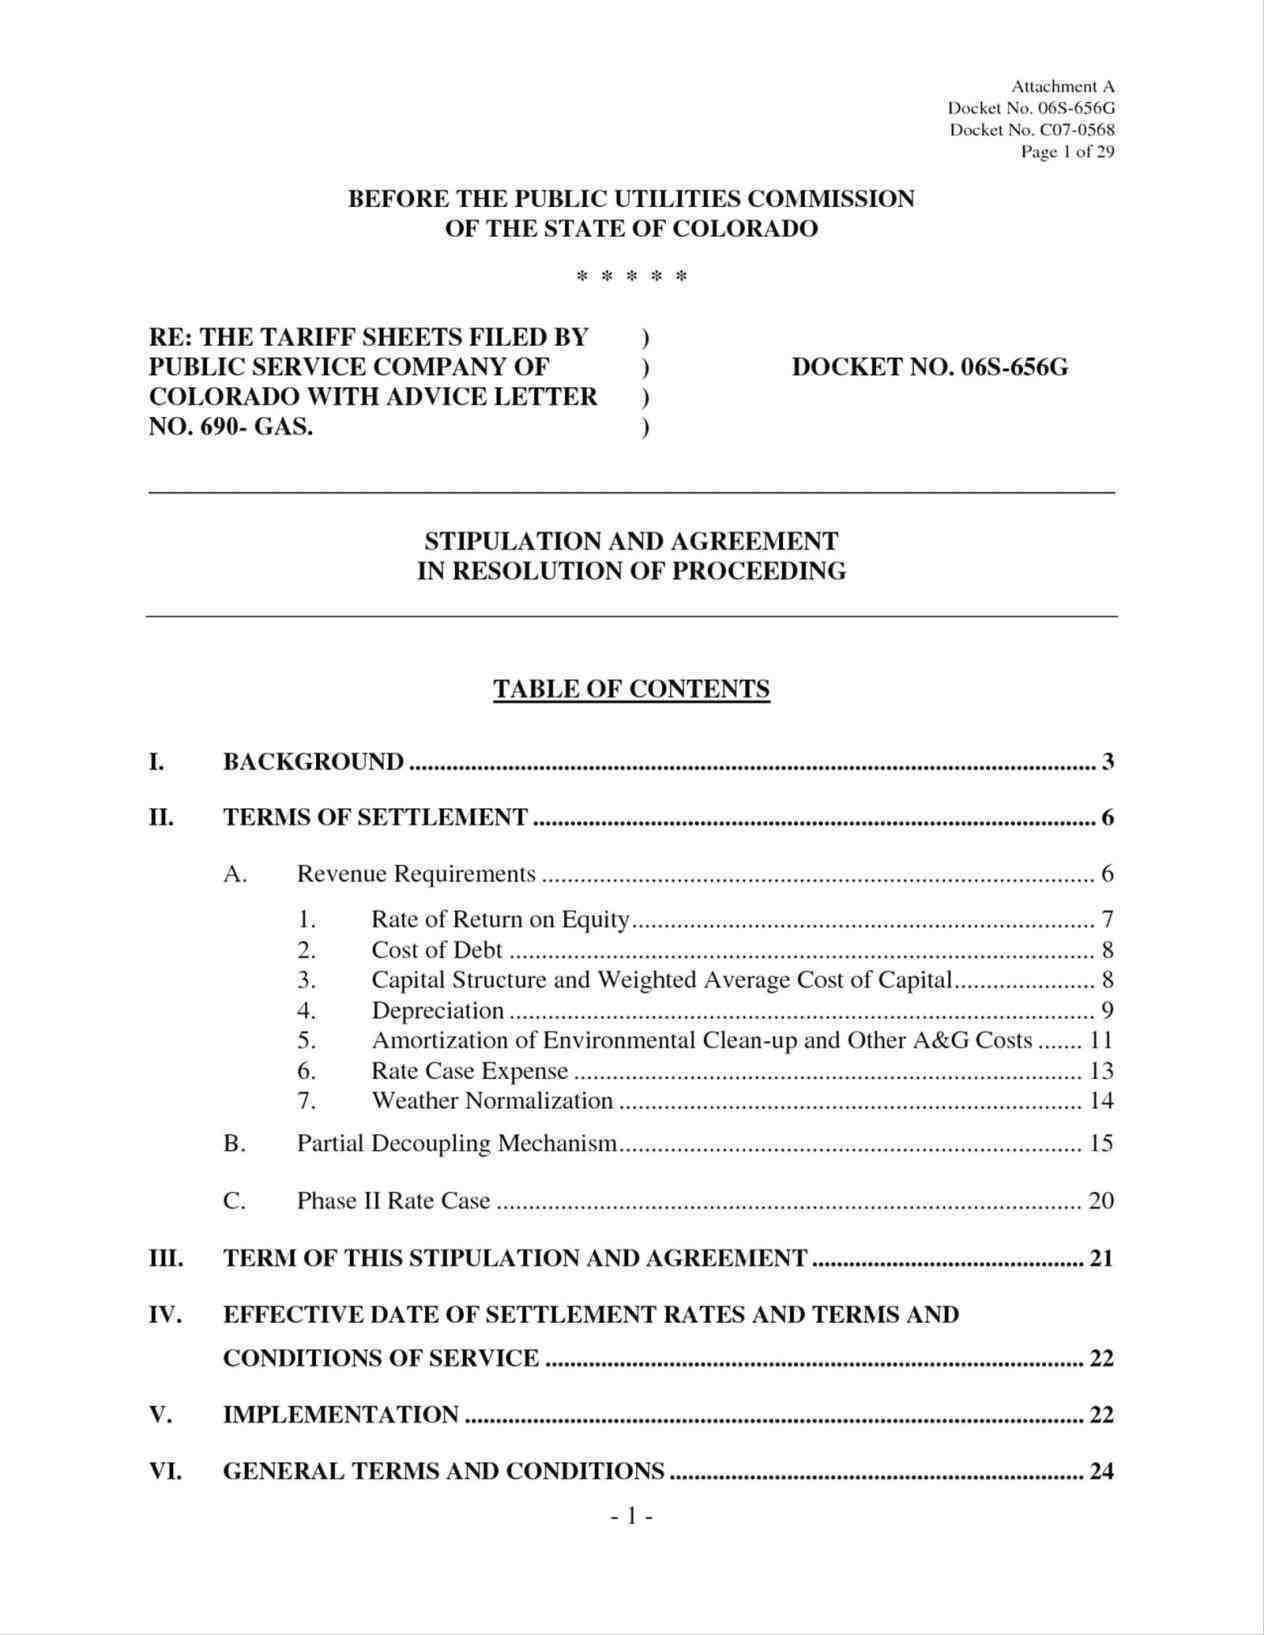 Debt Settlement Agreement Form Free